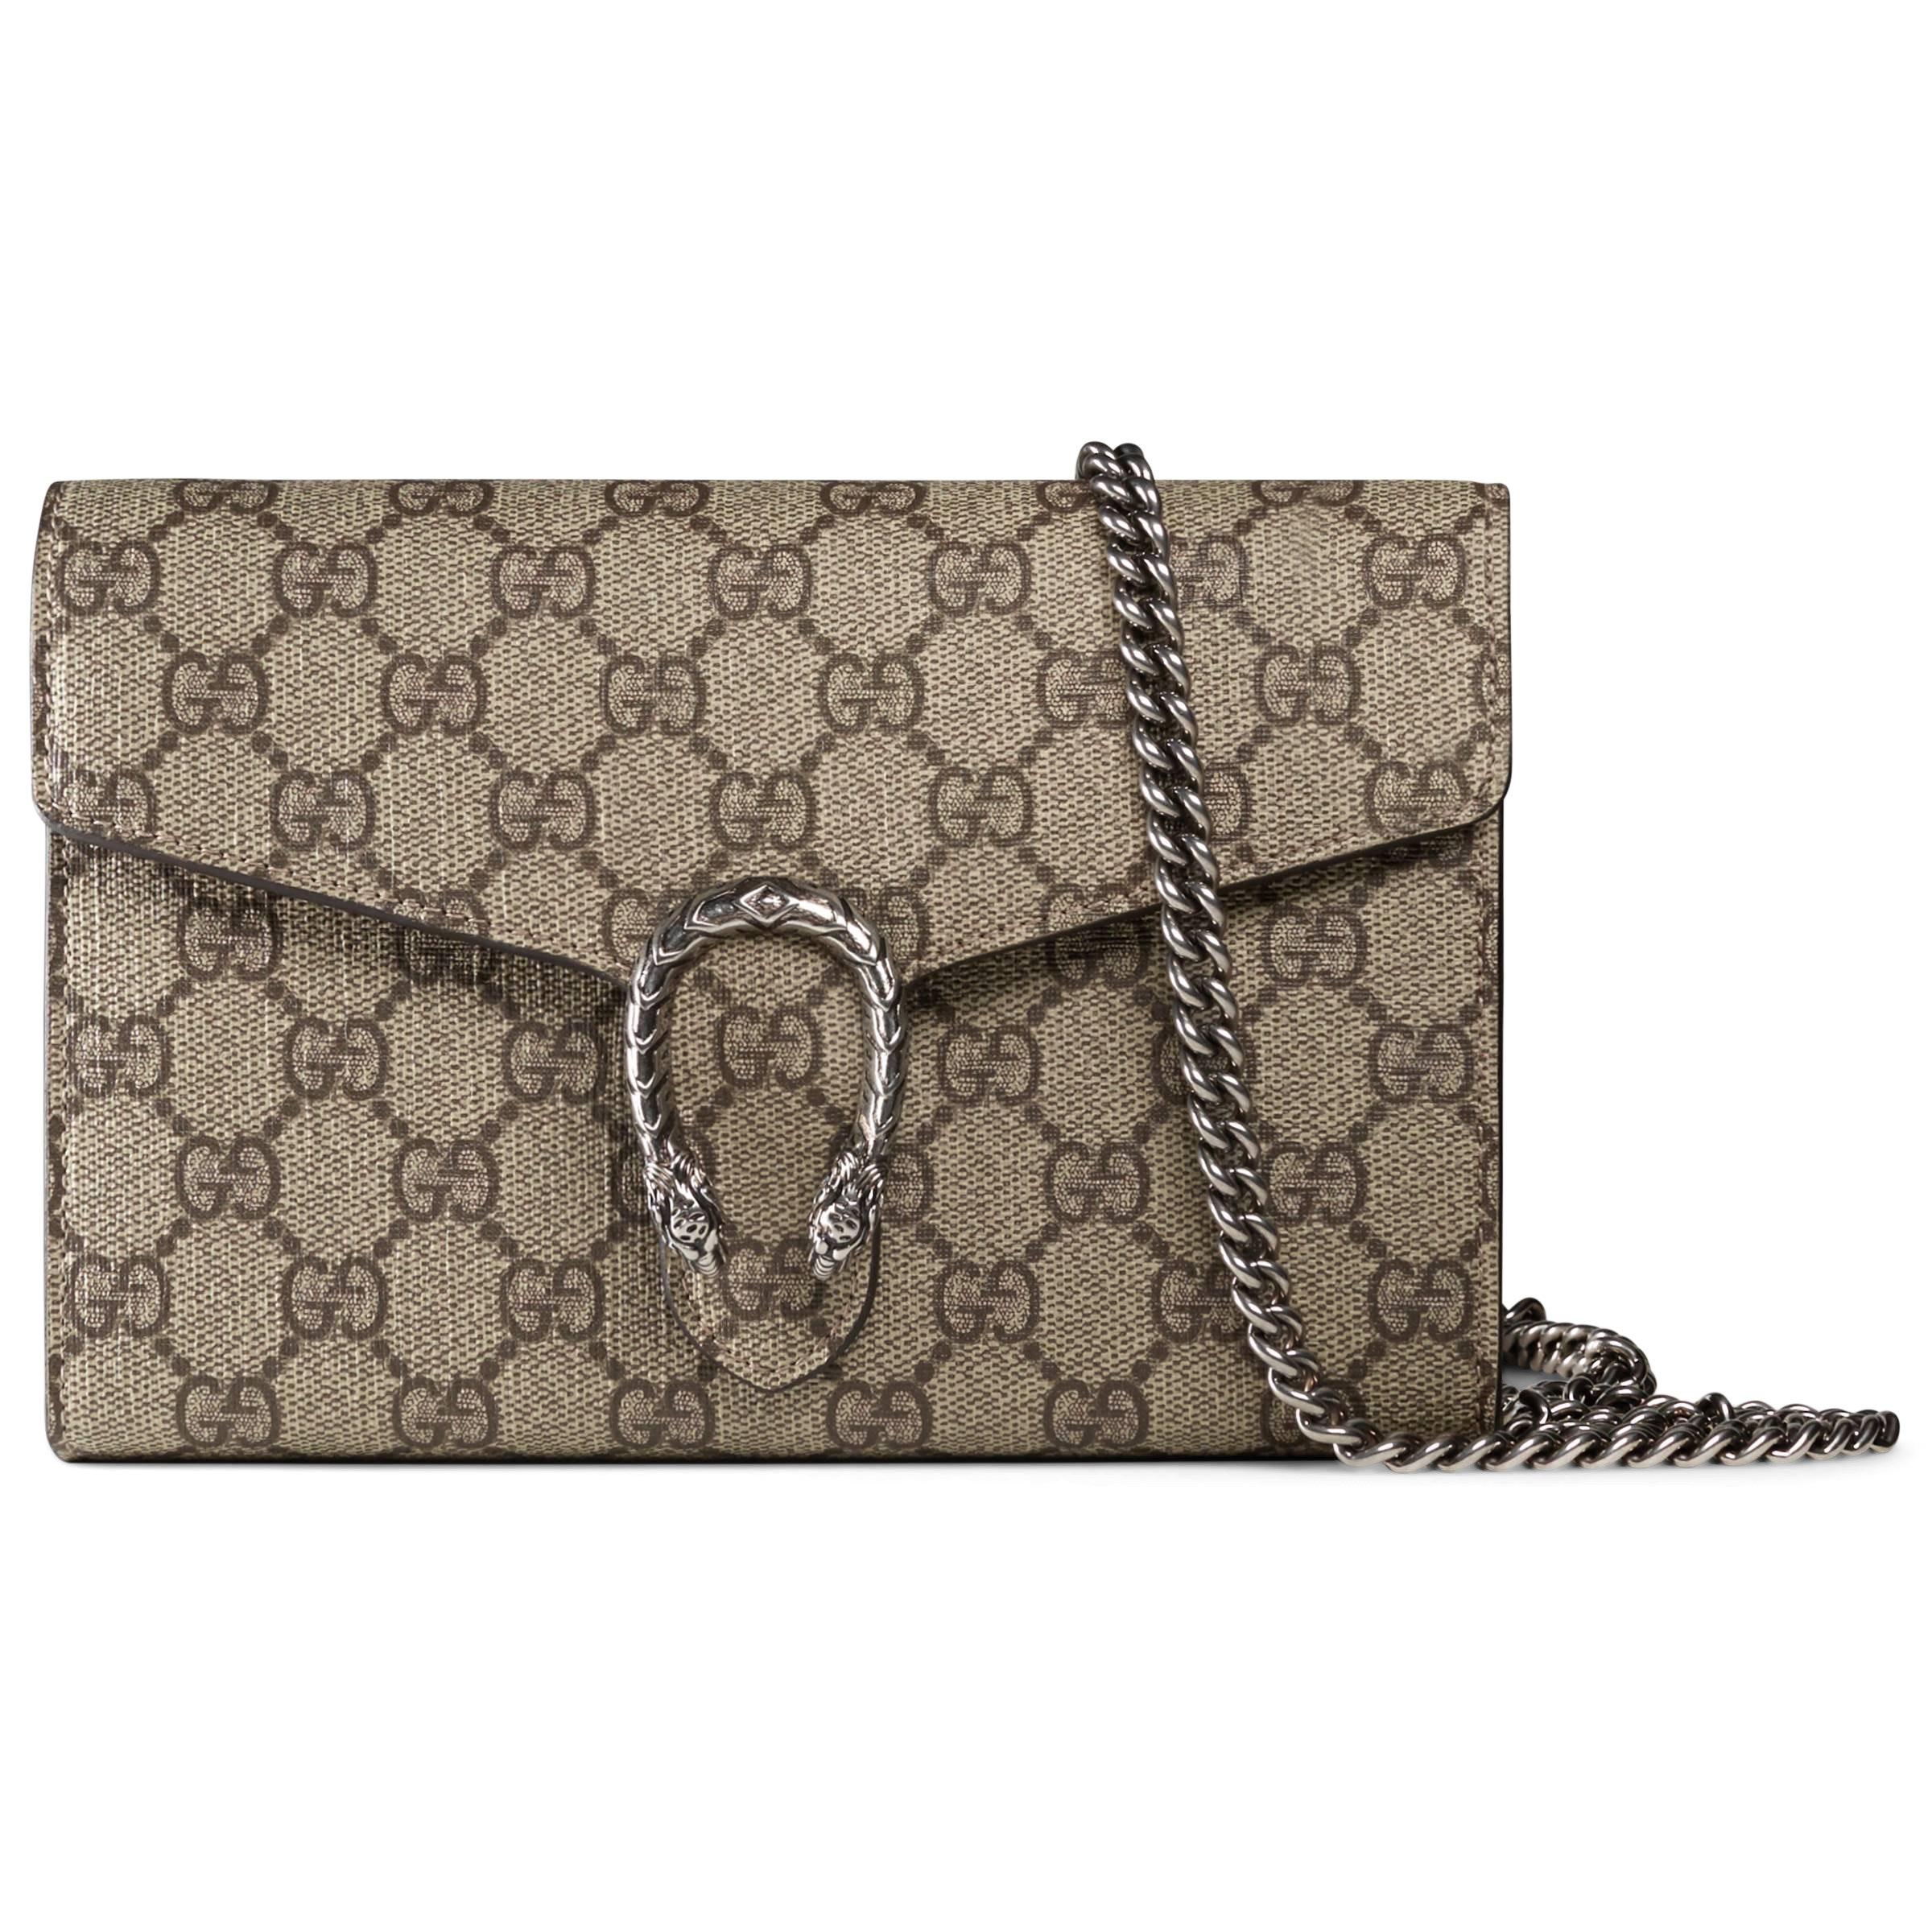 Gucci Dionysus Chain Wallet GG Supreme Beige/Ebony